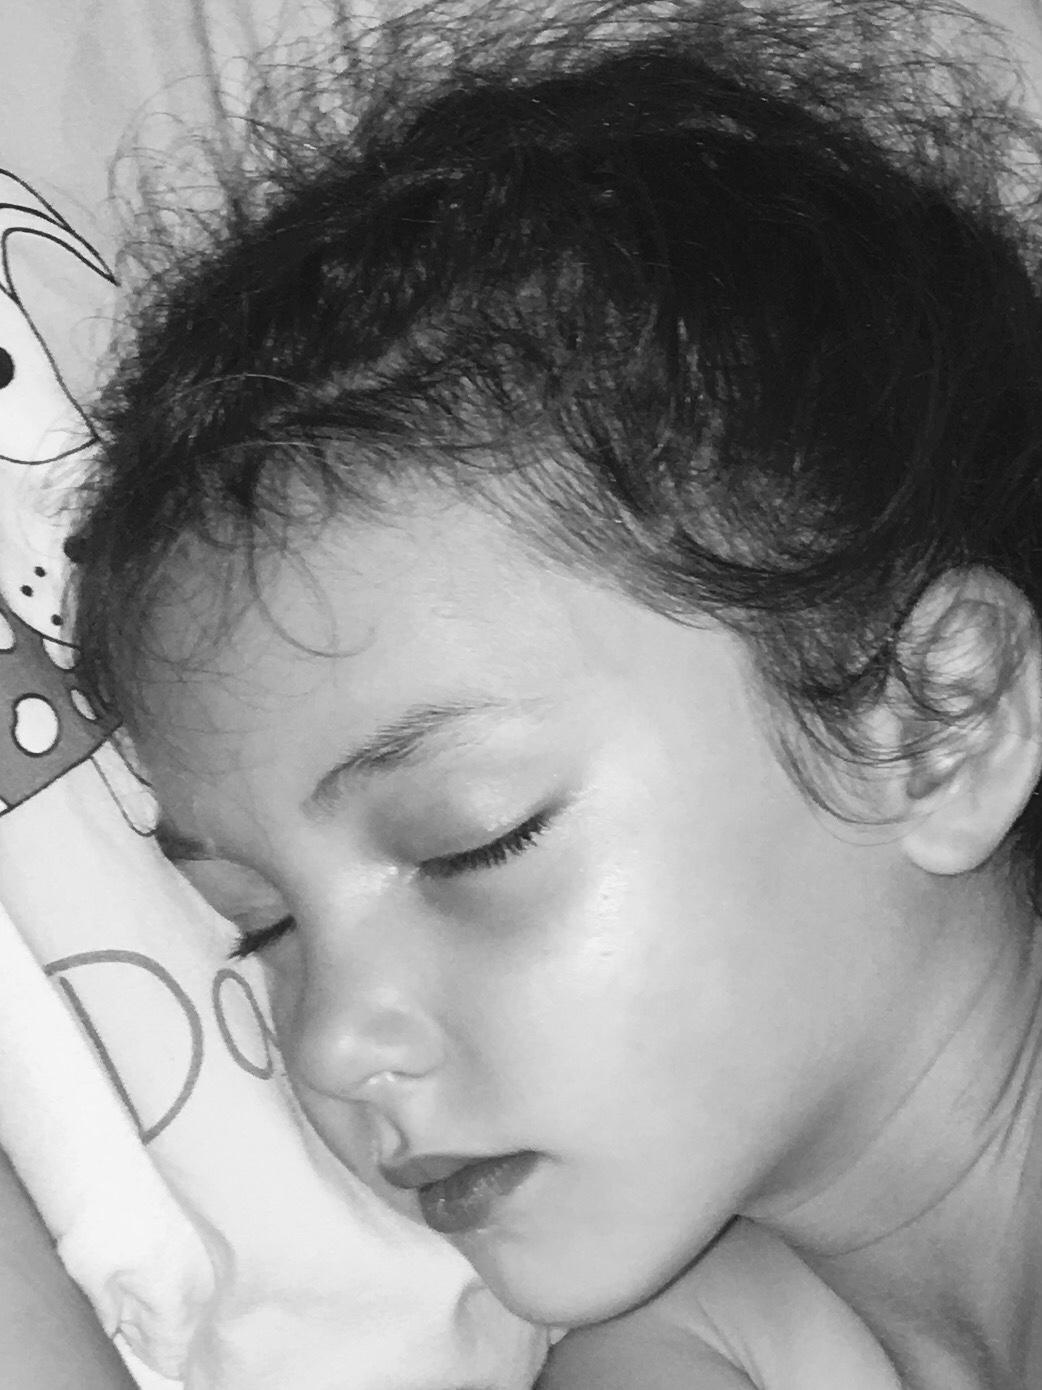 Hertford nutrition image of child sleeping